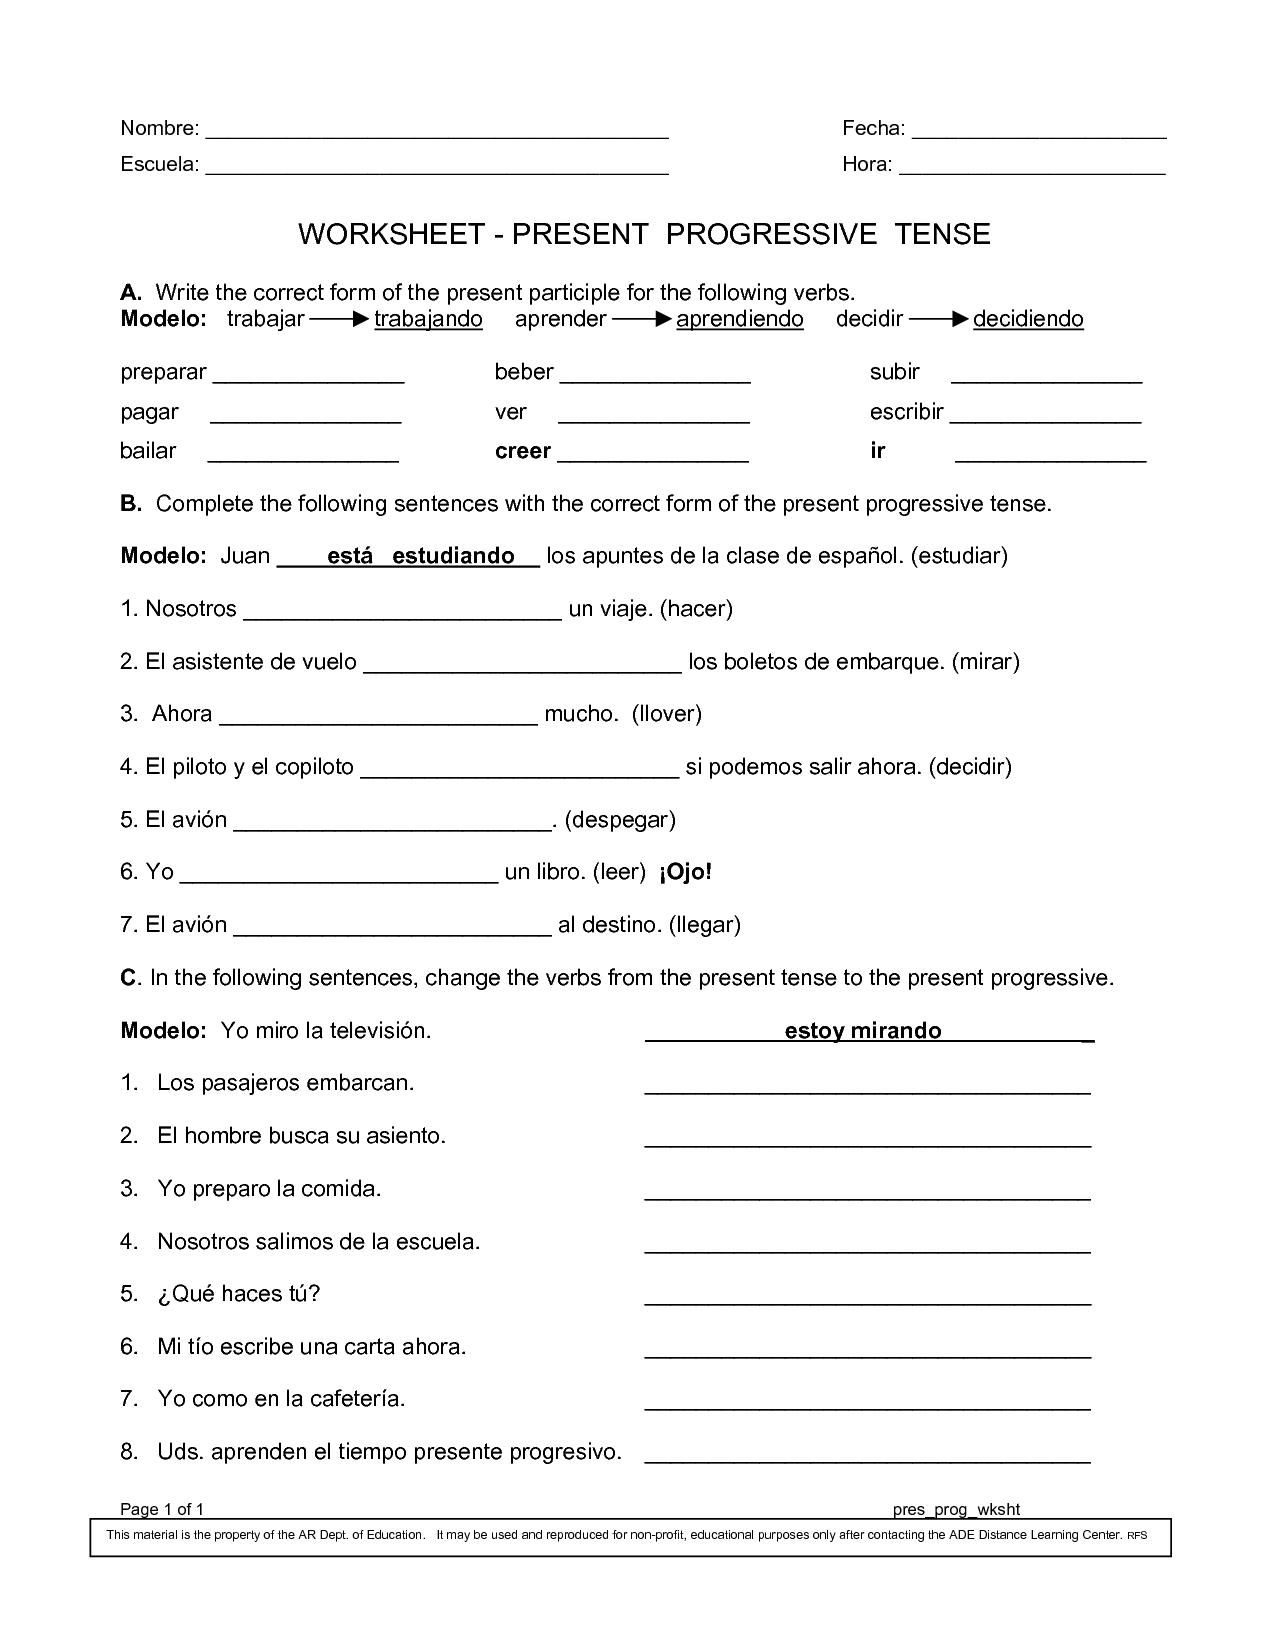 Spanish Progressive Worksheets Spanish Worksheets Present Progressive Spanish Spanish Teaching Res In 2021 Spanish Worksheets Present Progressive Spanish Spanish Verbs [ 1650 x 1275 Pixel ]